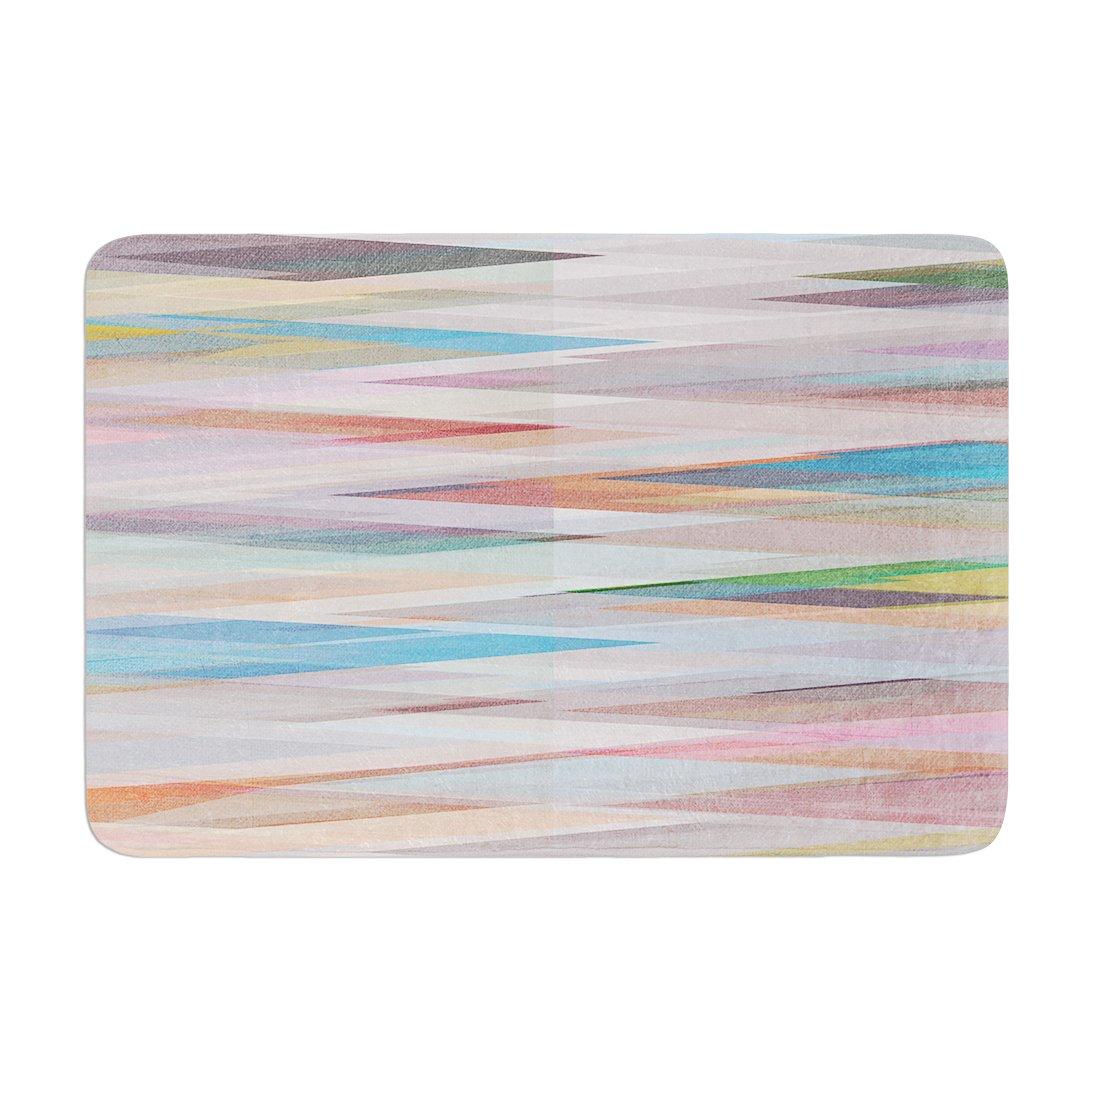 17 by 24 Kess InHouse Mareike Boehmer Nordic Combination II Rainbow Abstract Memory Foam Bath Mat